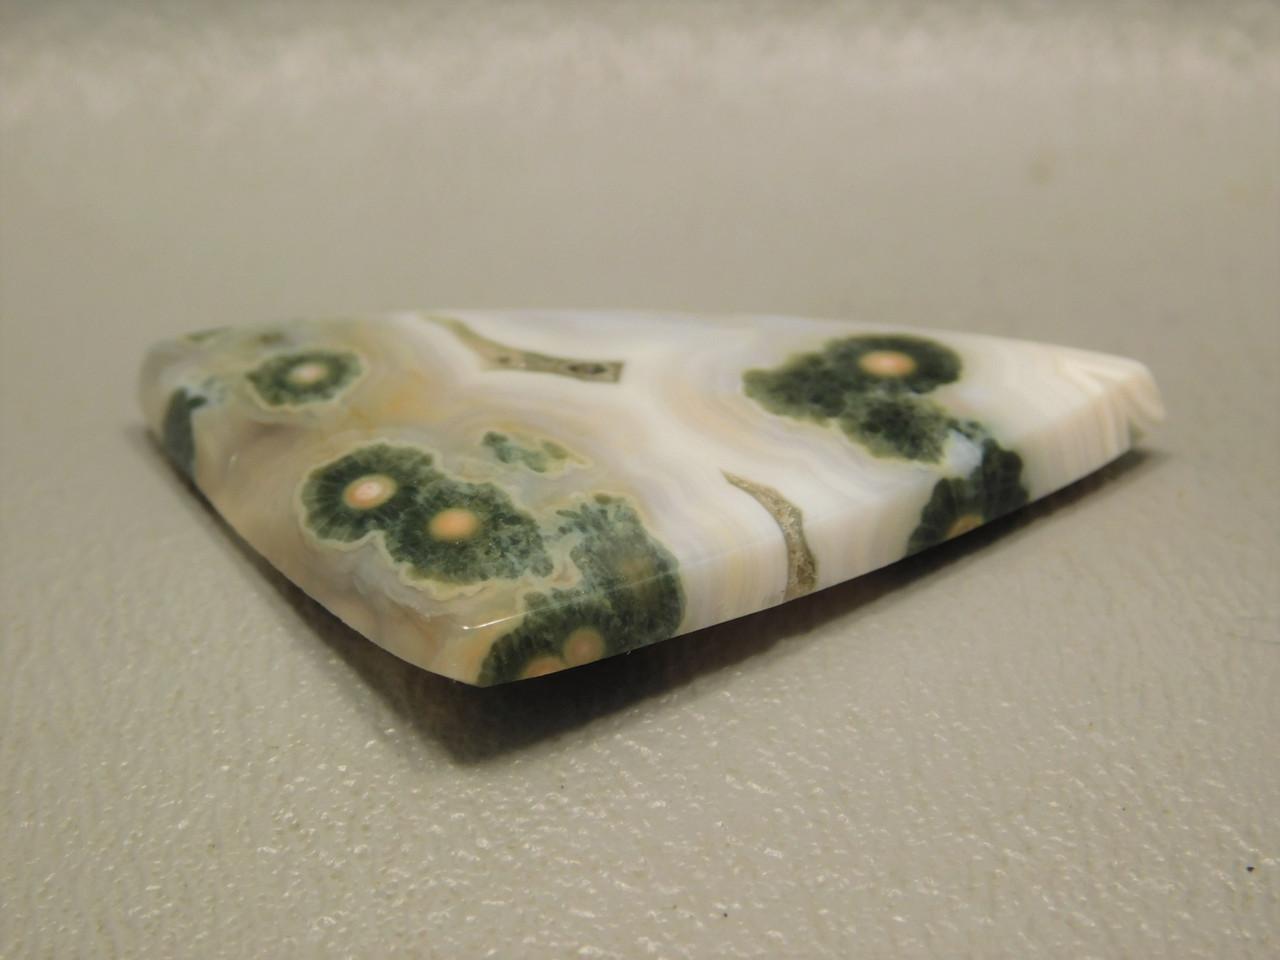 Orbicular Ocean Jasper Loose Stone Jewelry Cabochon #24